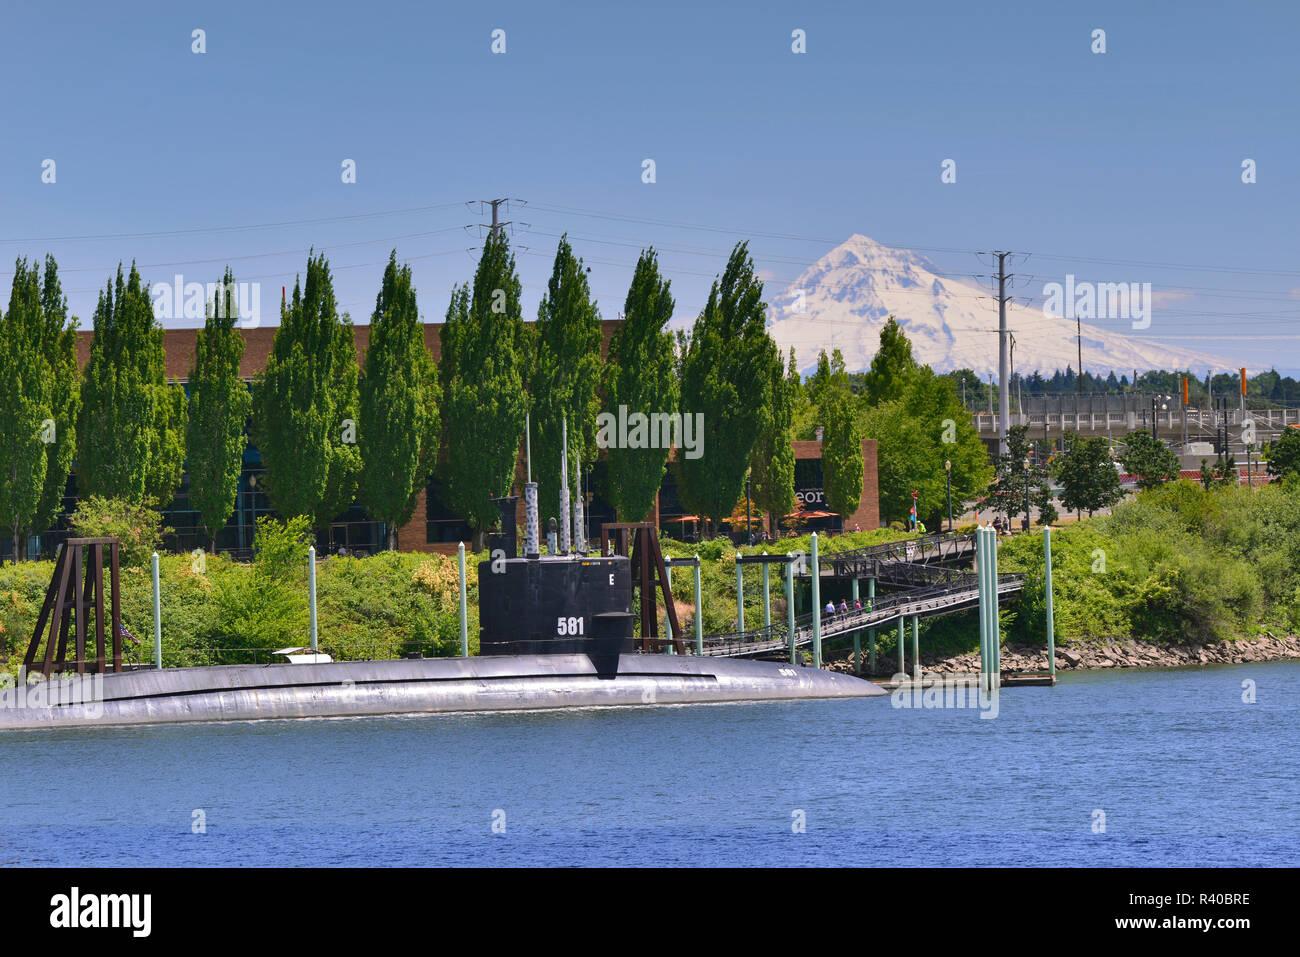 USA, Oregon, Portland  USS Blueback (SS-581) submarine and